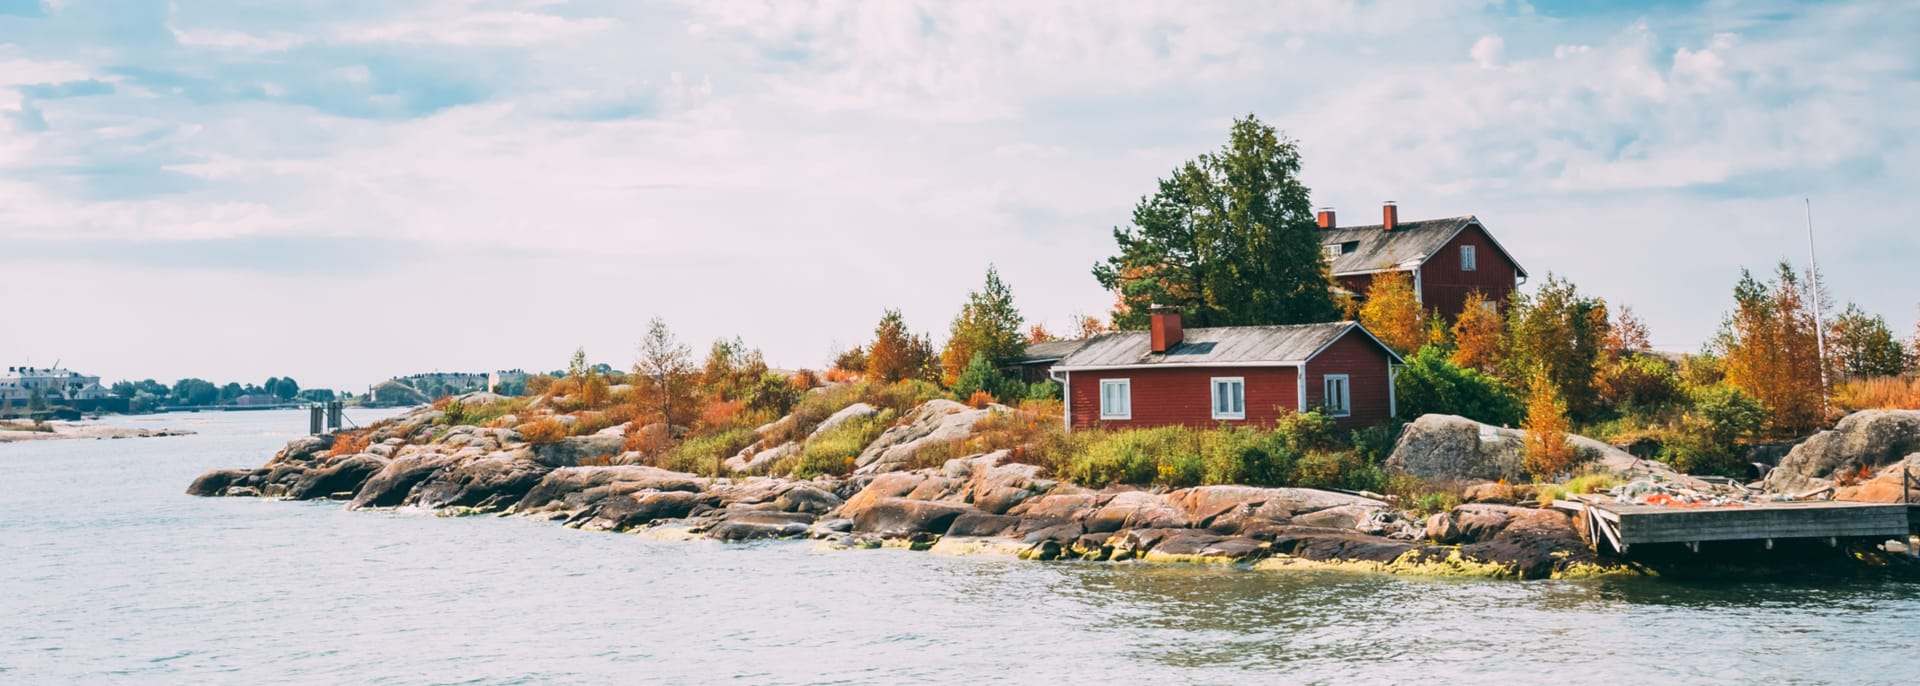 Helsinki, Finnland